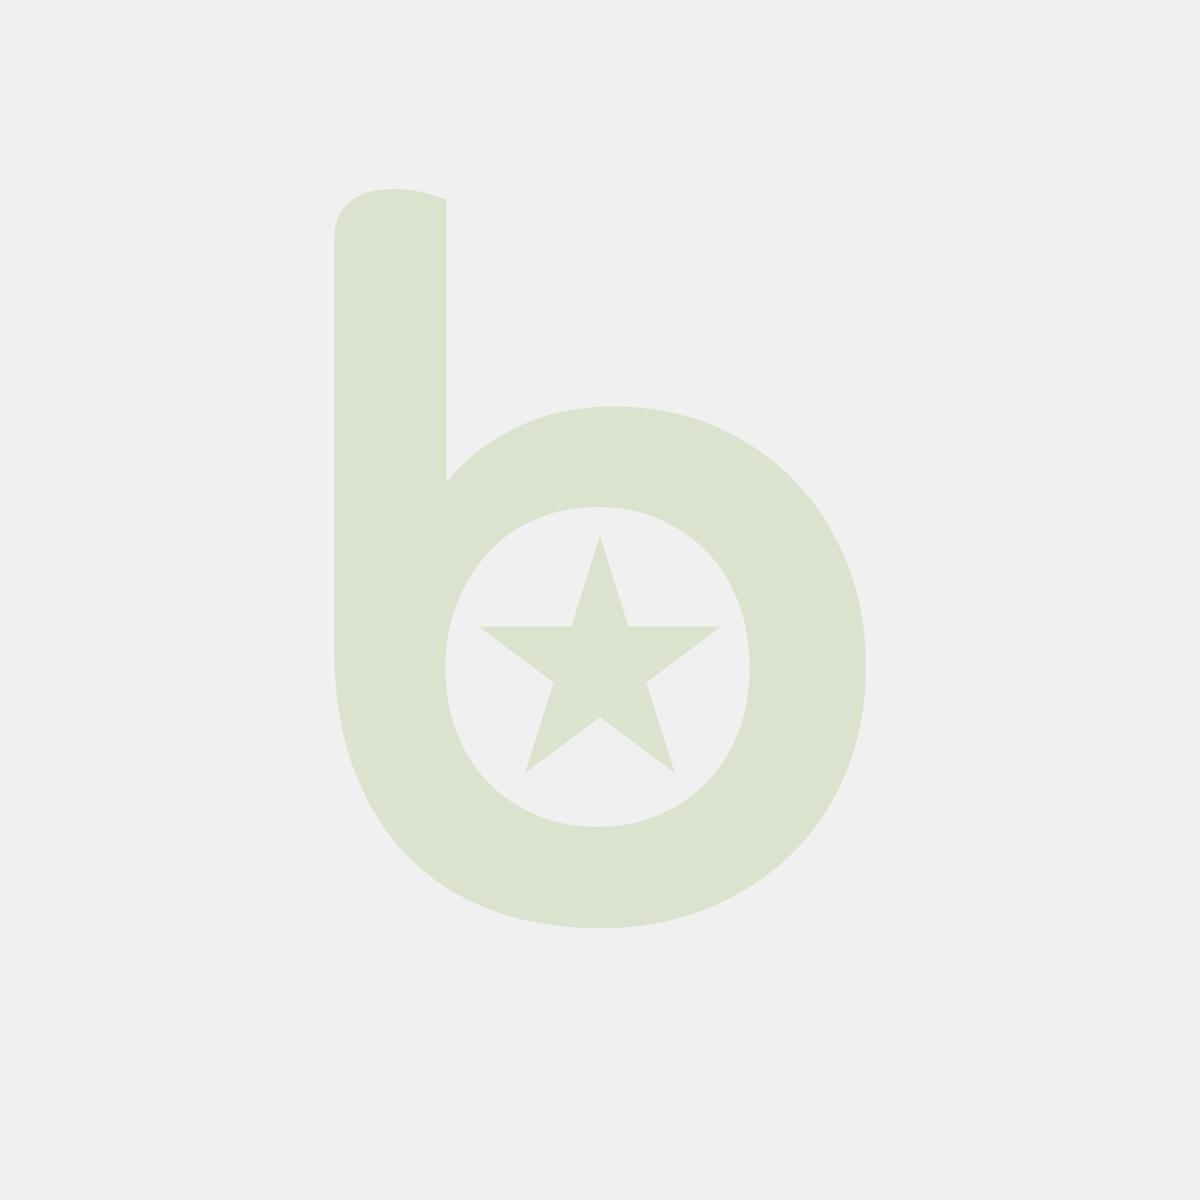 Serwetki PAPSTAR Royal Collection Damascato 40x40 szary, opakowanie 50szt